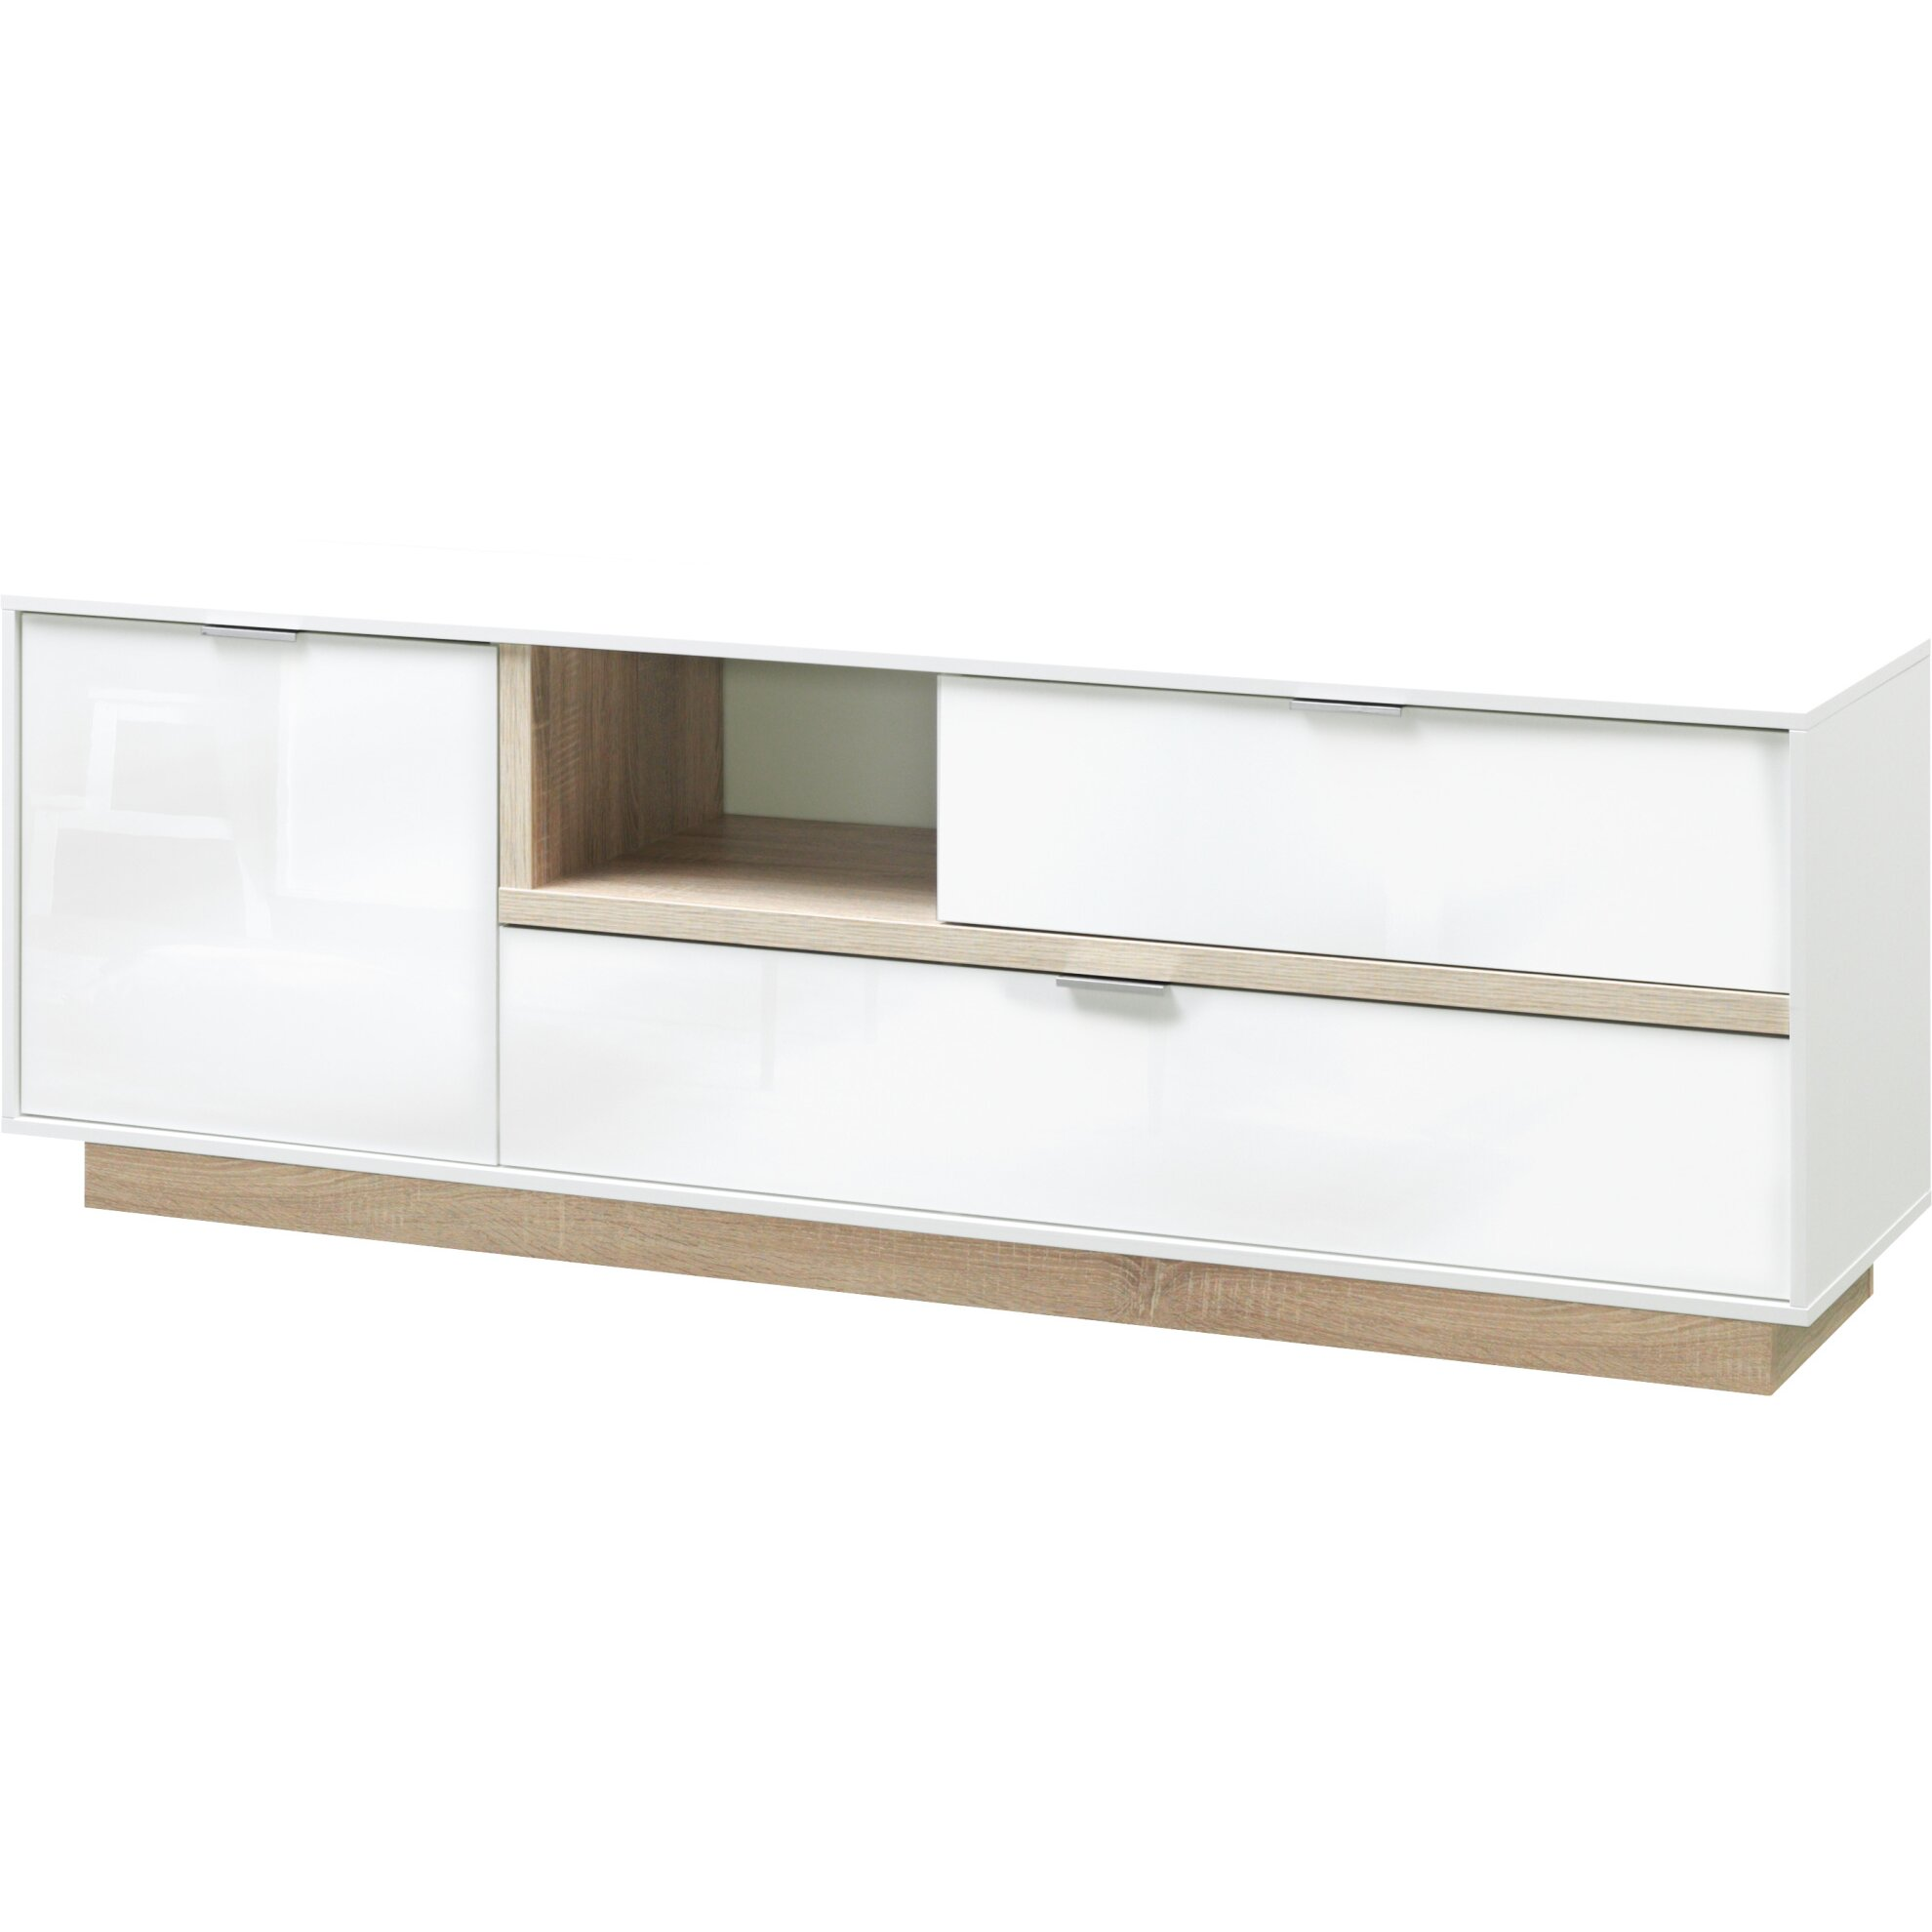 15 sparen cs schmal tv lowboard my ell nur 239 99 cherry m bel wayfair. Black Bedroom Furniture Sets. Home Design Ideas